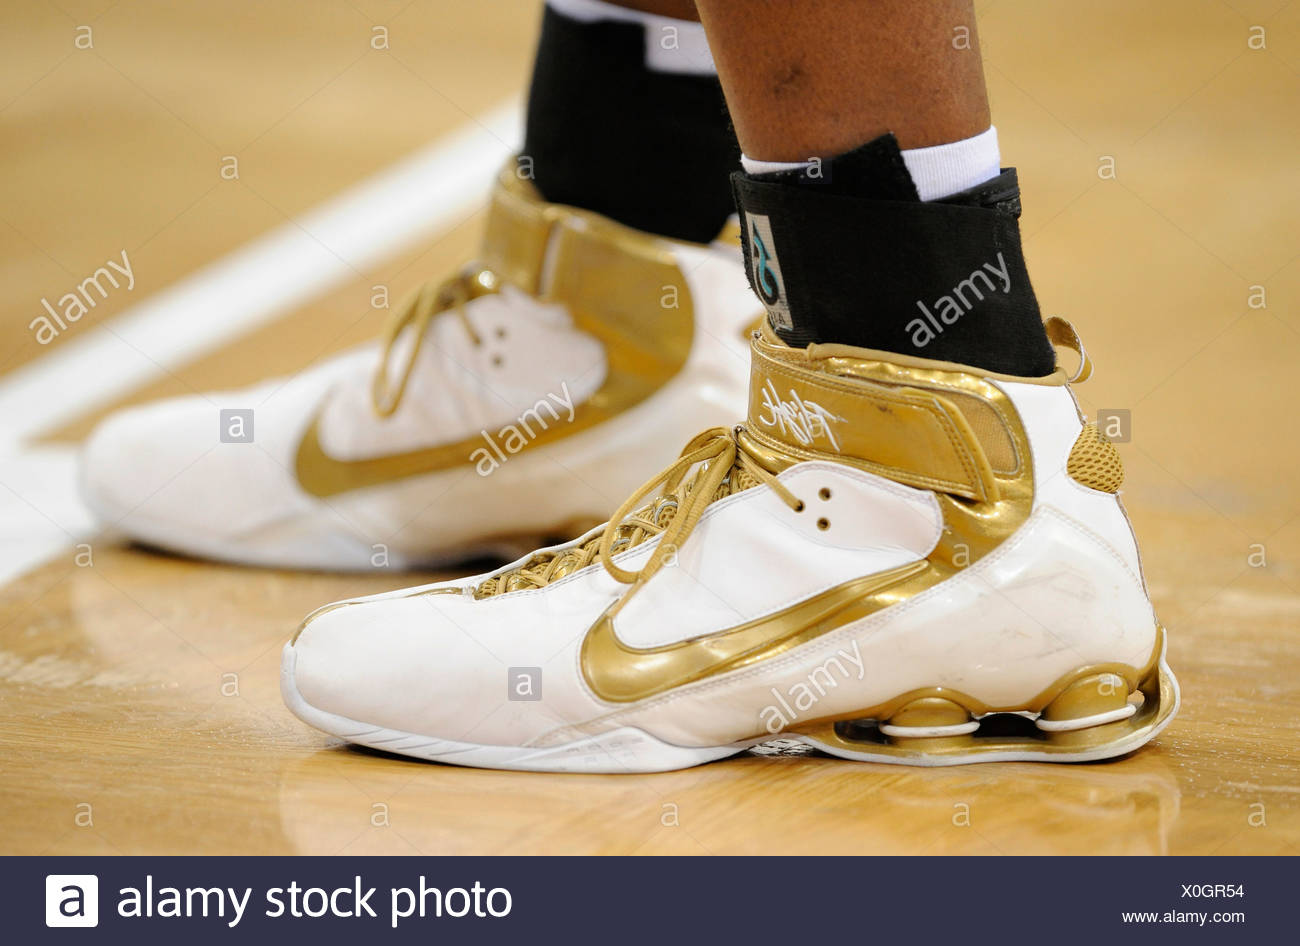 baecc4c4 Basketball Shoes Stock Photos & Basketball Shoes Stock Images - Alamy